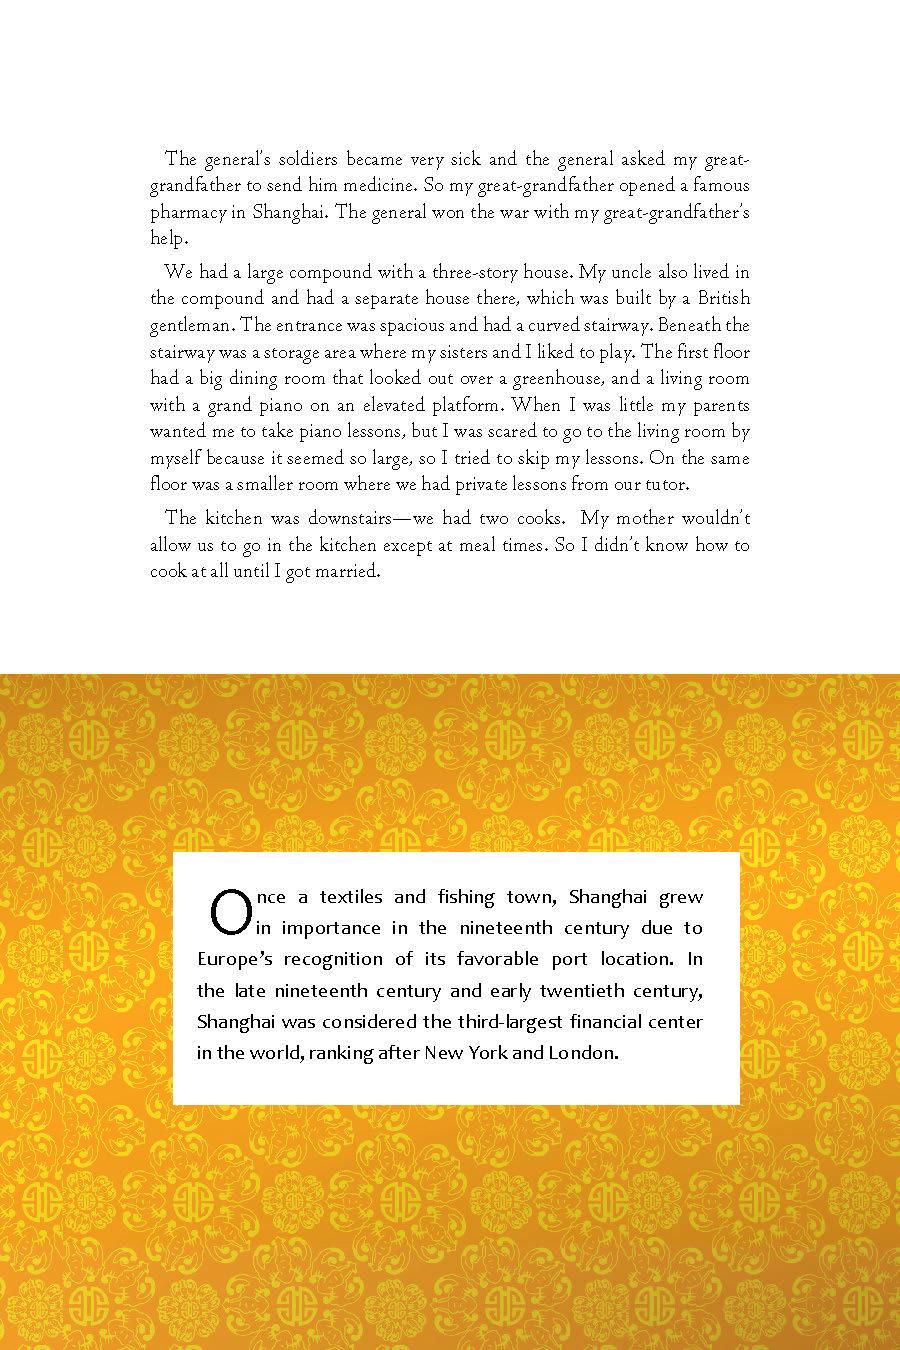 binder4_page_15.jpg